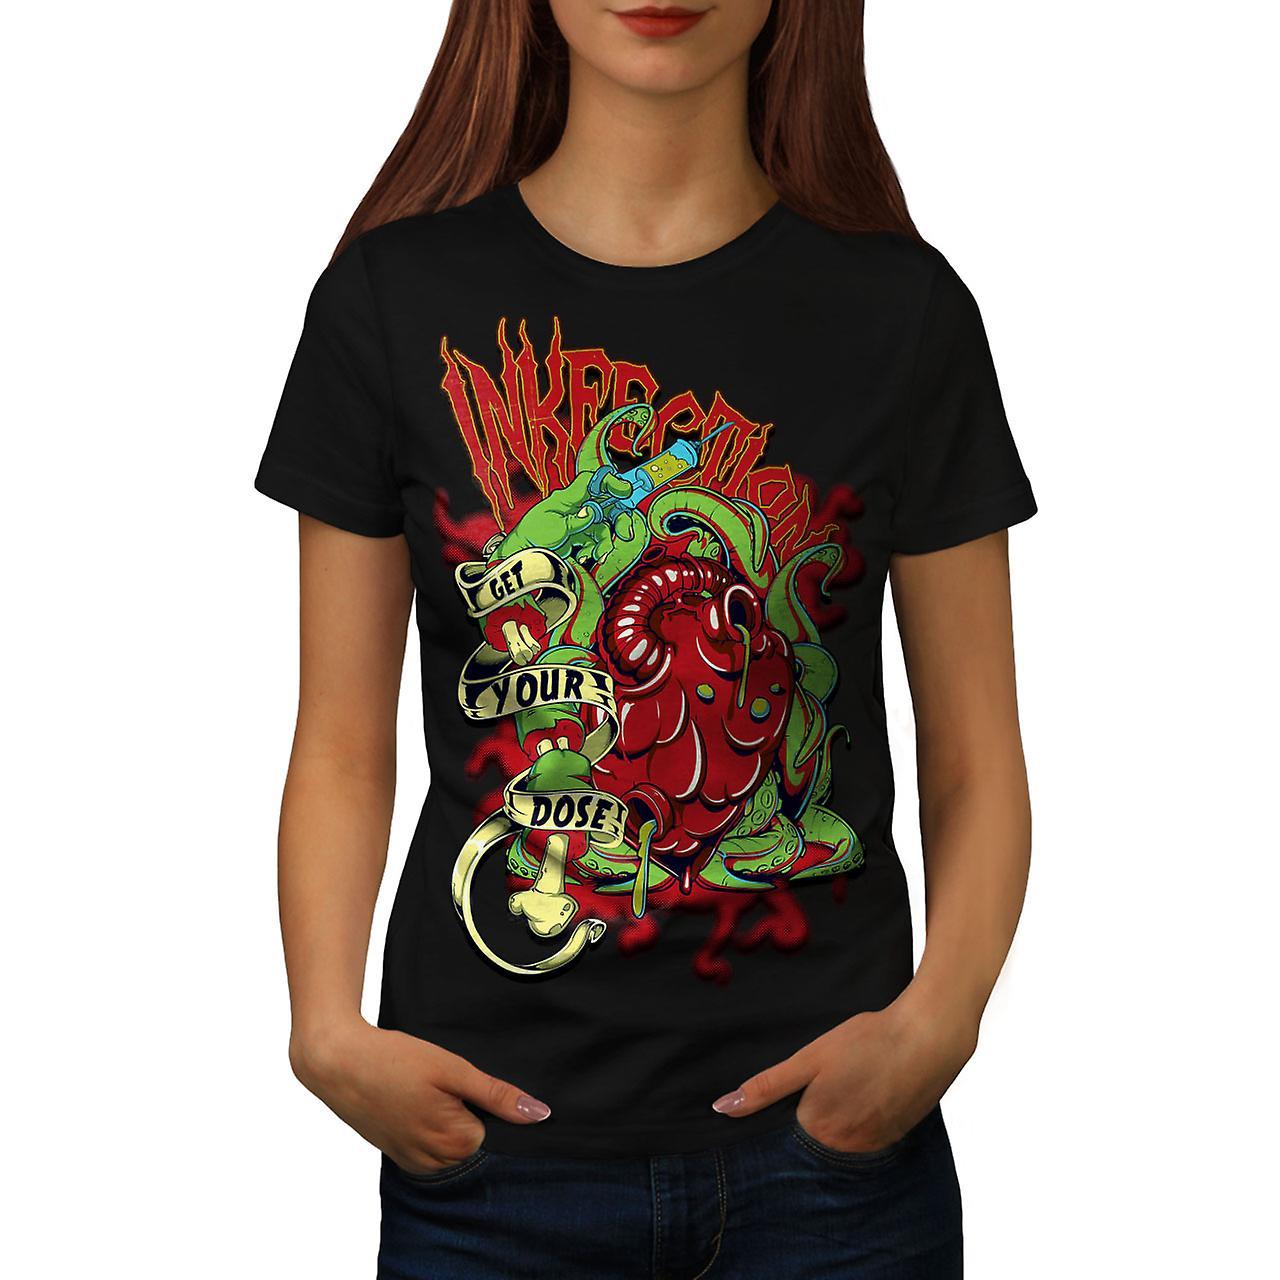 Get Your Dose Dead Horror Women Black T-shirt | Wellcoda